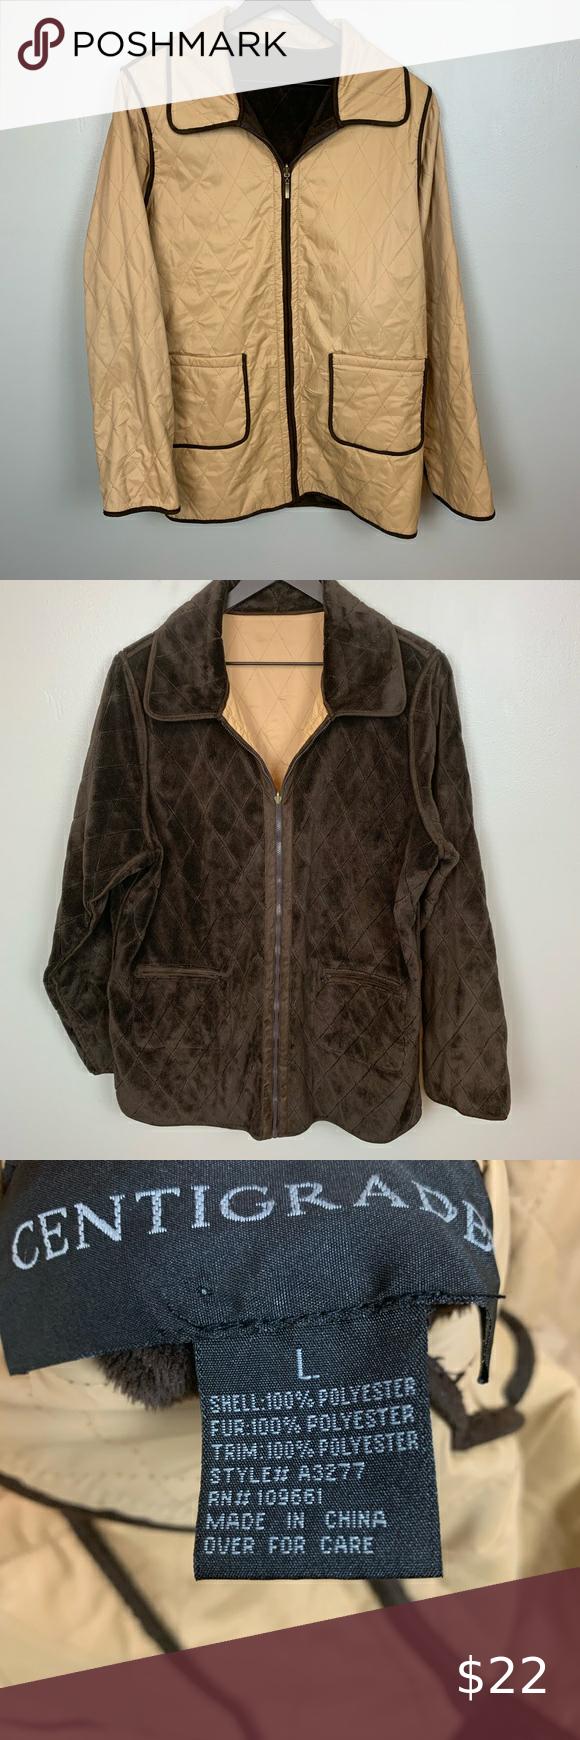 Centigrade Reversible Jacket Brown Tan Size L Reversible Jackets Jackets Jackets For Women [ 1740 x 580 Pixel ]